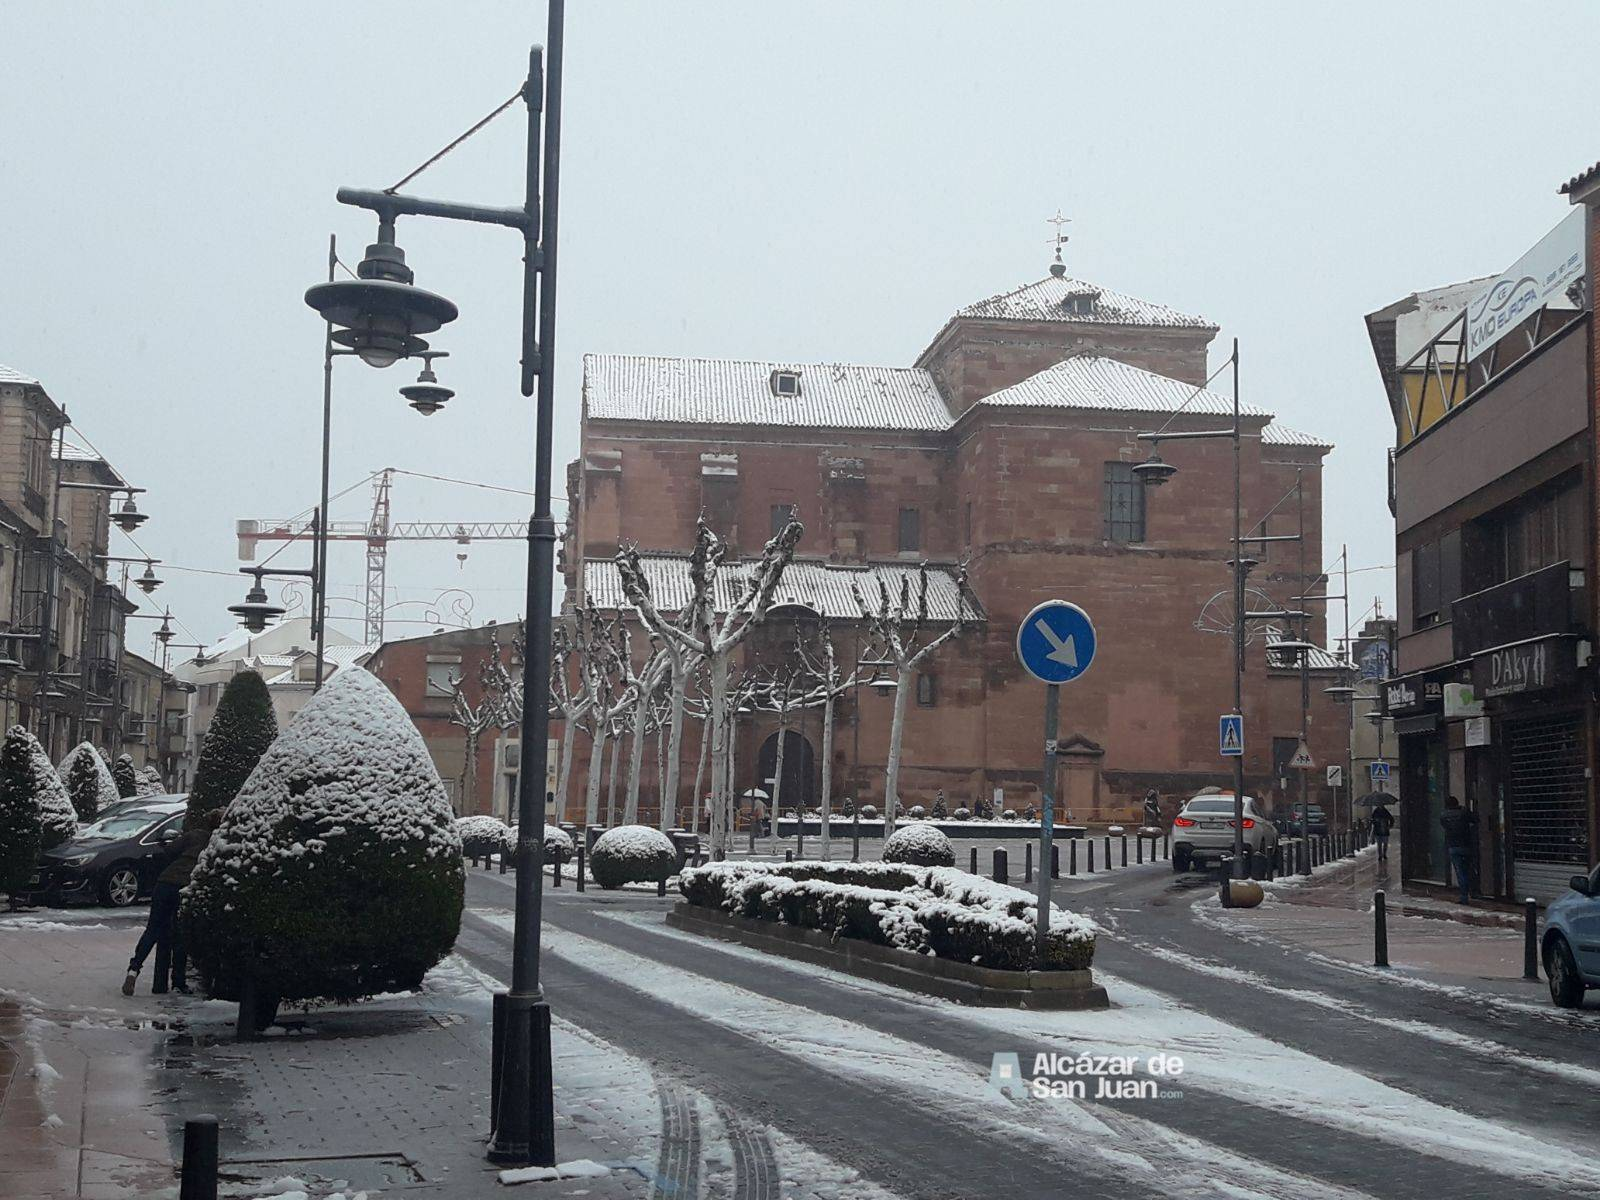 alcazar-calles-nieve-1 1